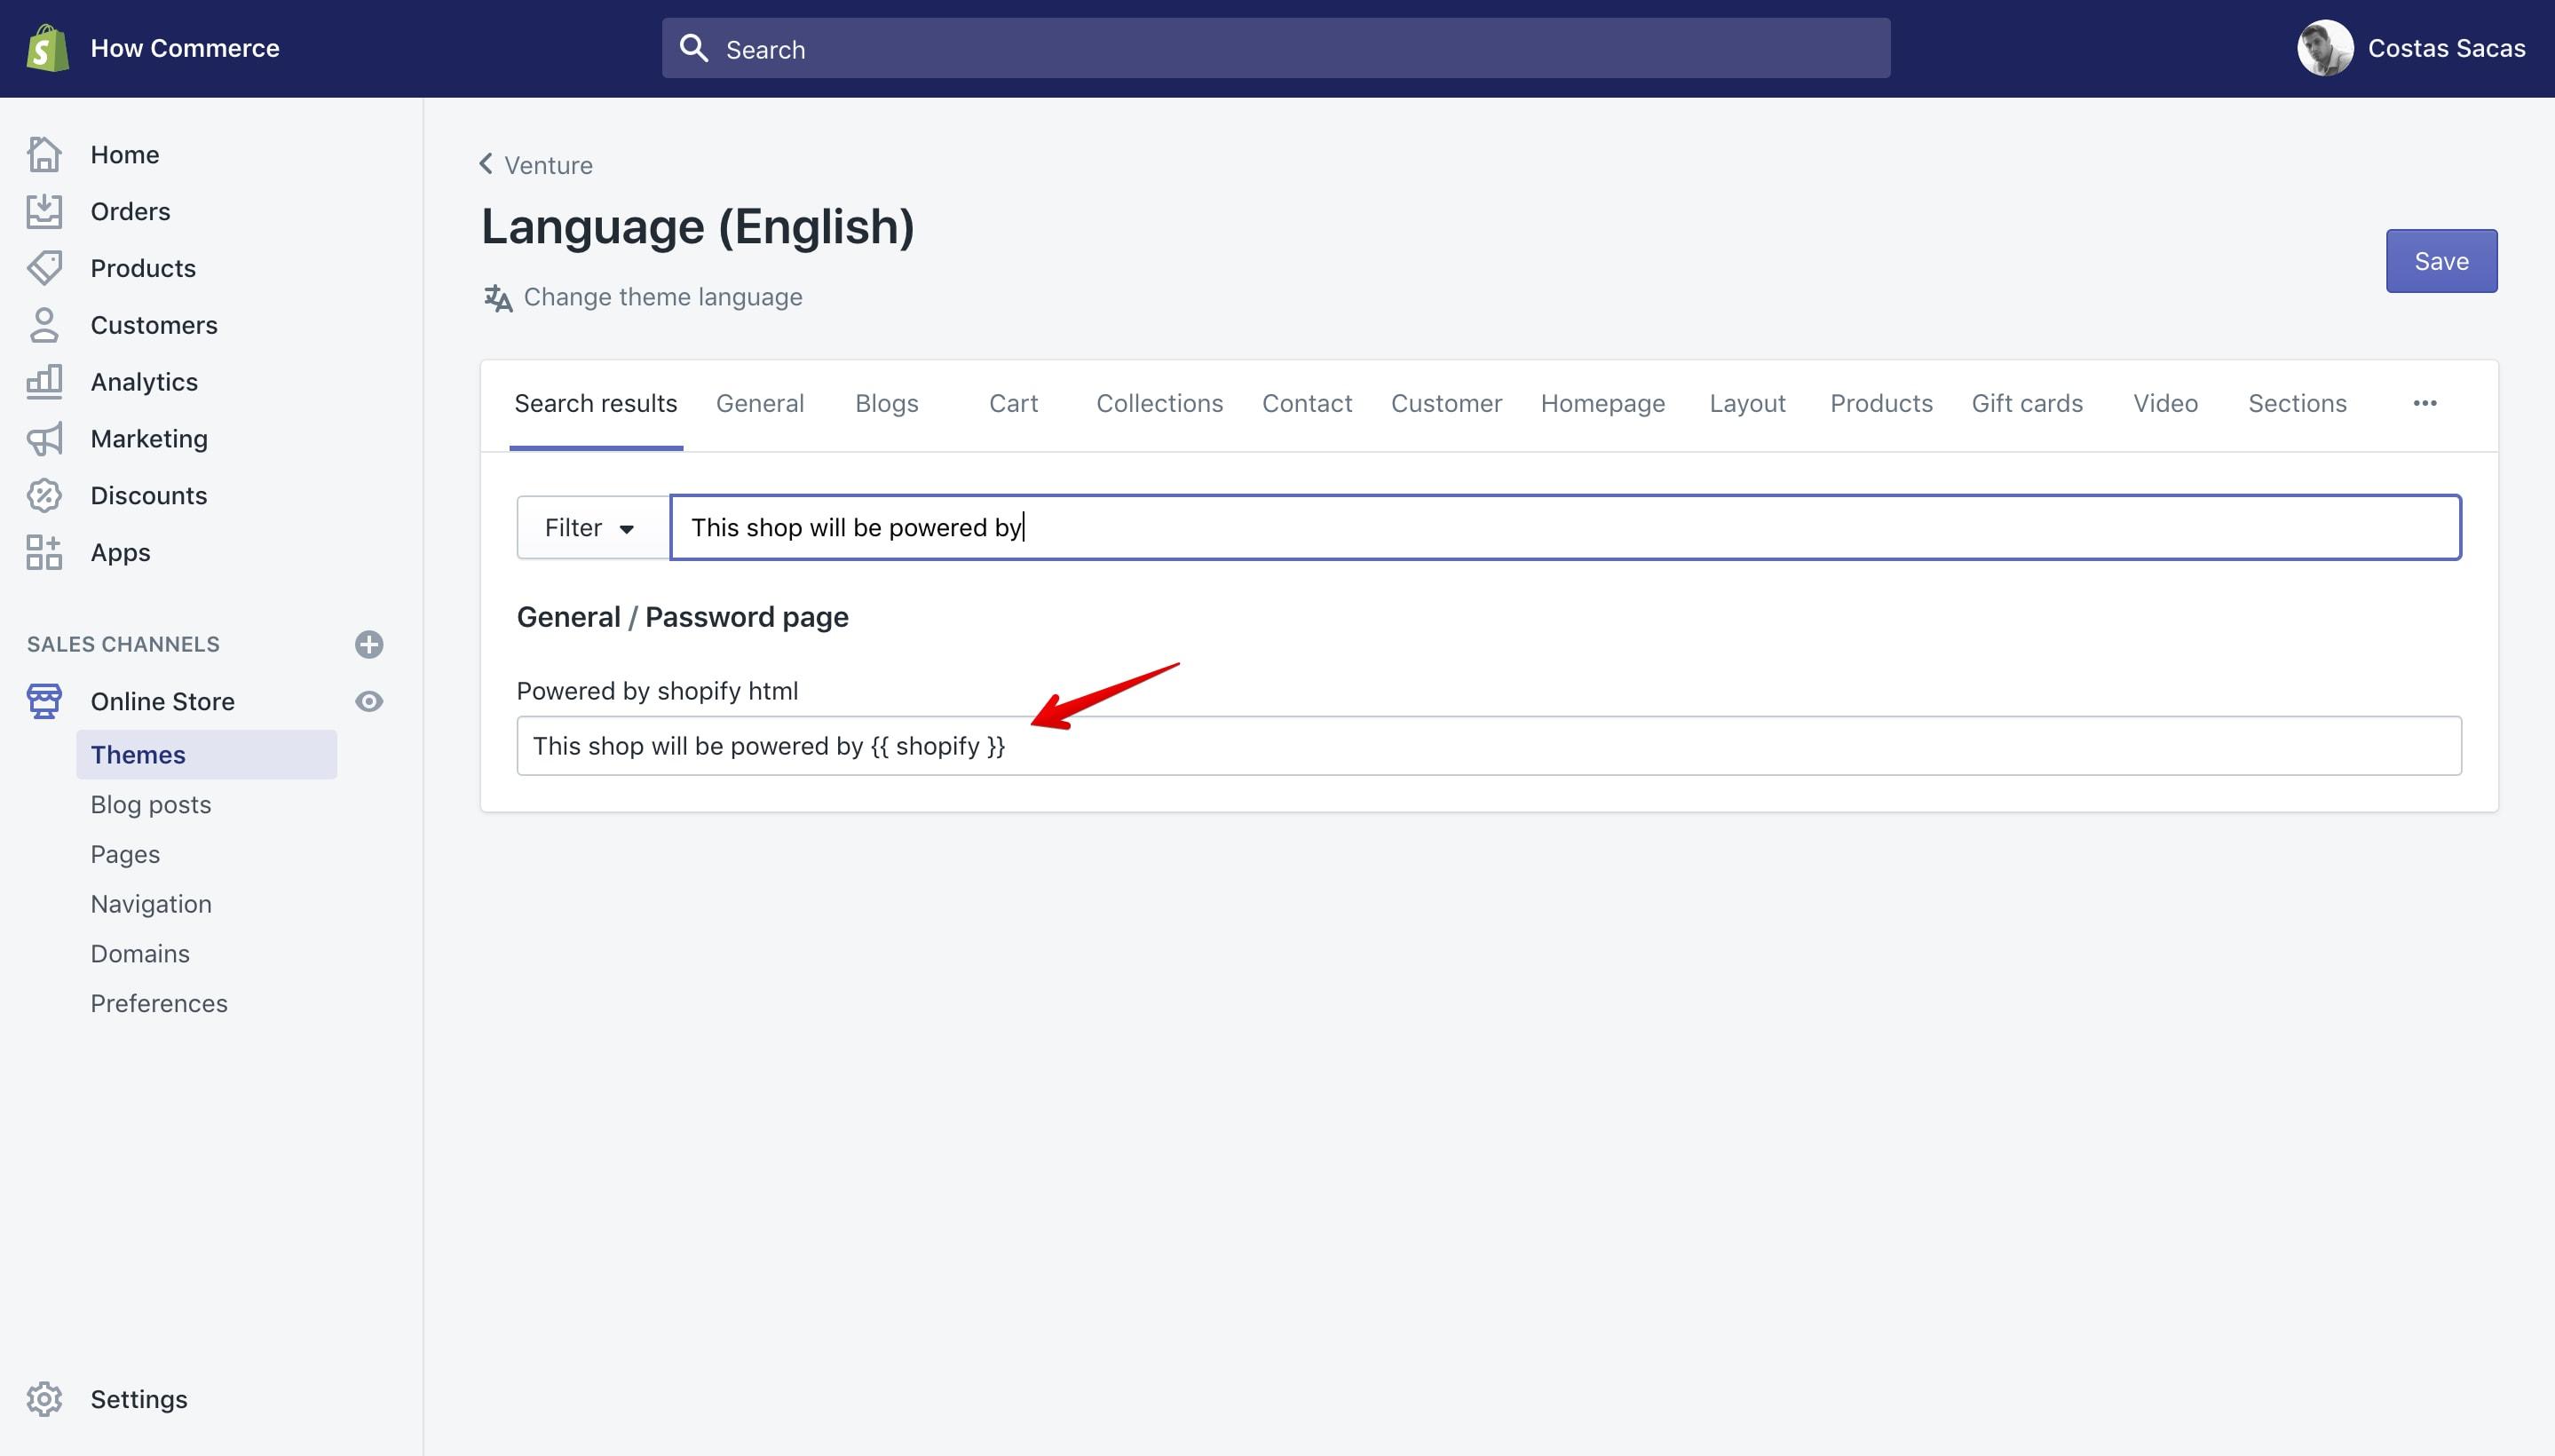 Venture theme remove offline page copyright text.